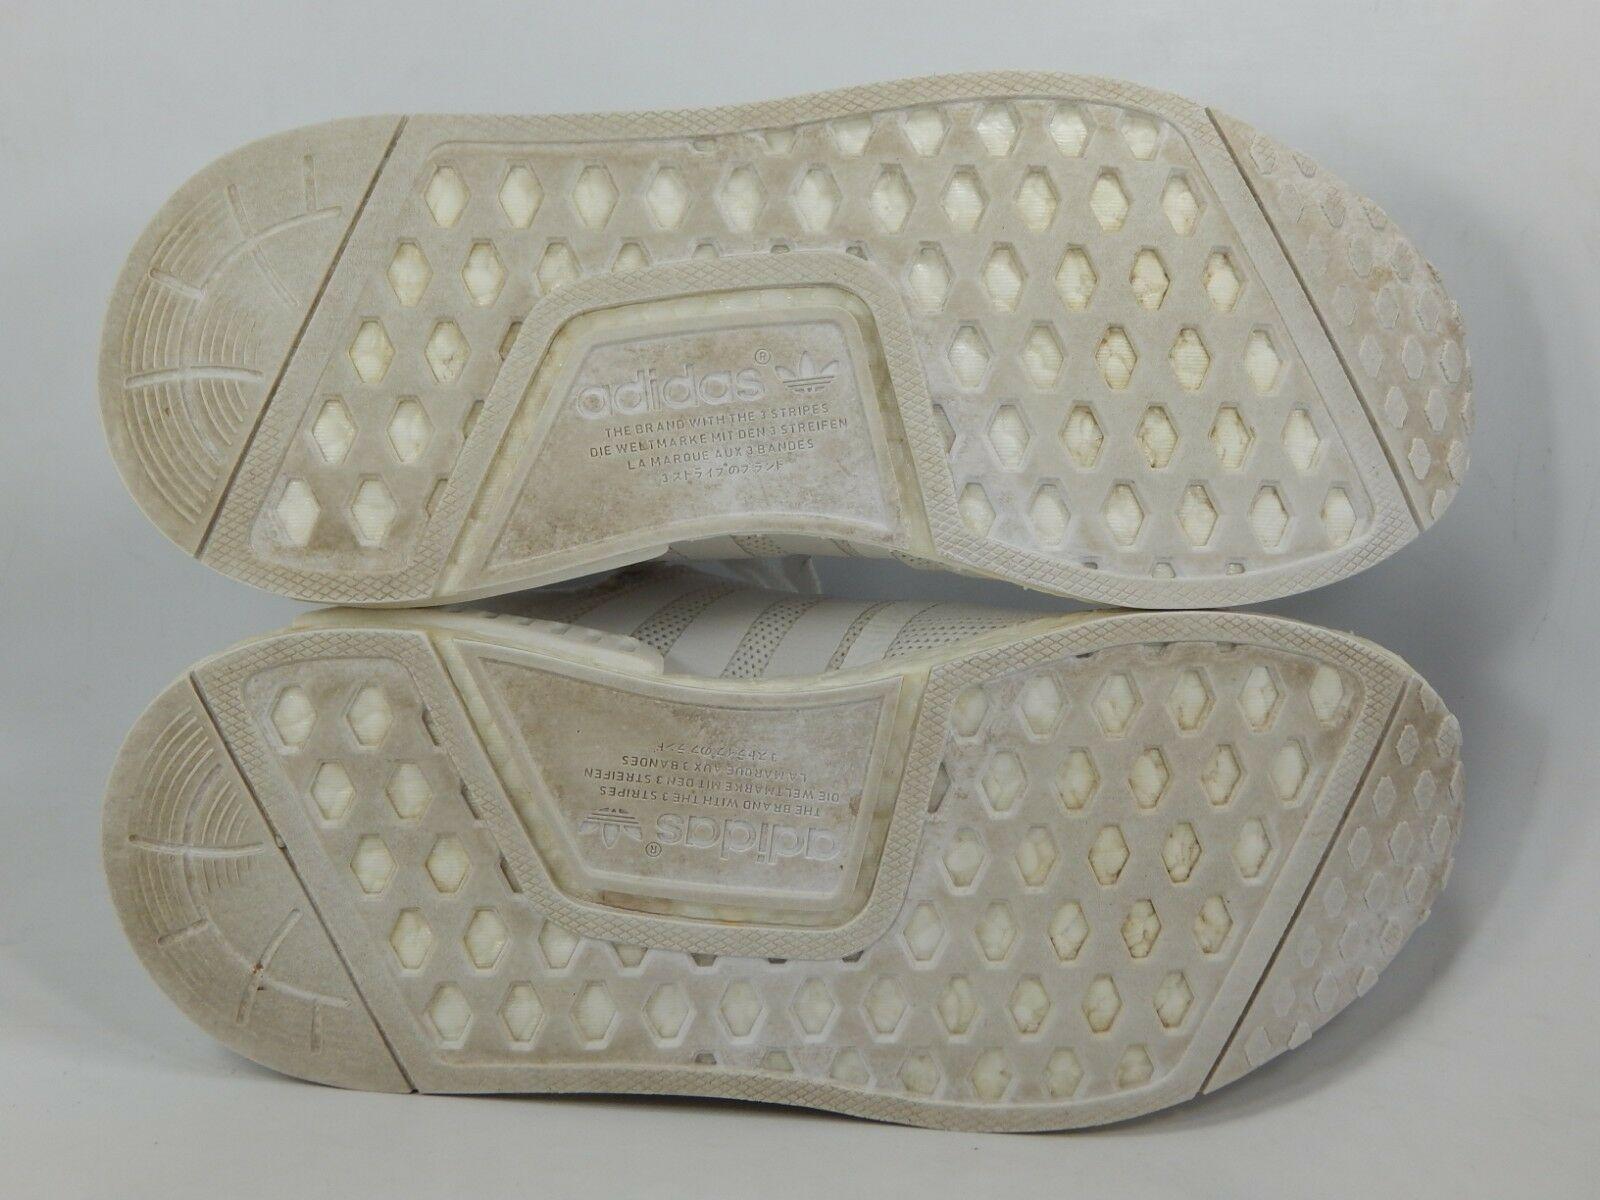 Adidas Nmd R1 Triple Blanco Talla 5M (y) Eu 37 1/3 Juventud